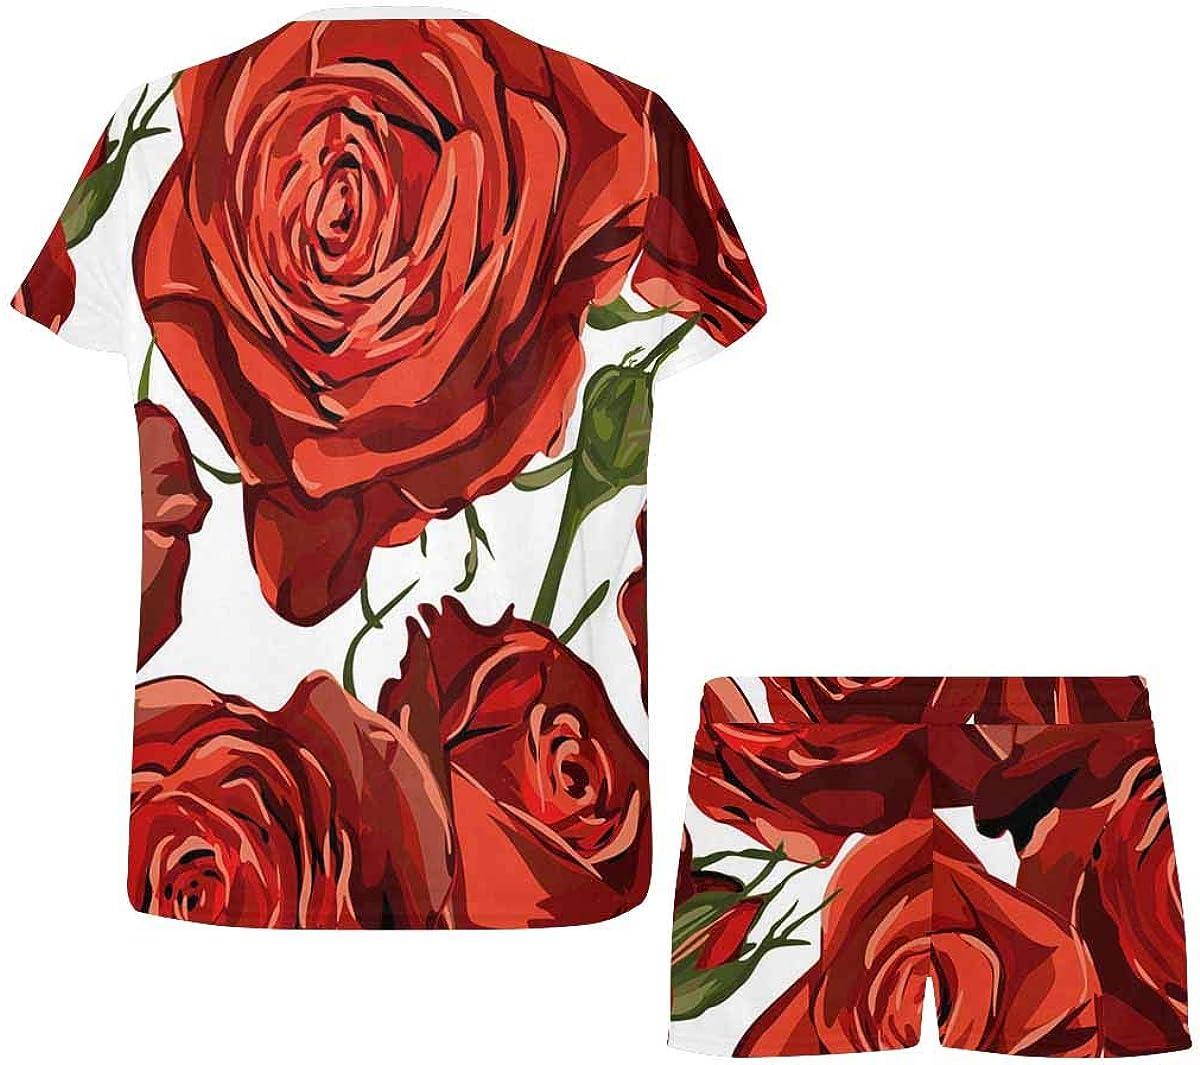 InterestPrint Red Roses Pattern Women's Lightweight Pajama Set, Short Summer Pjs